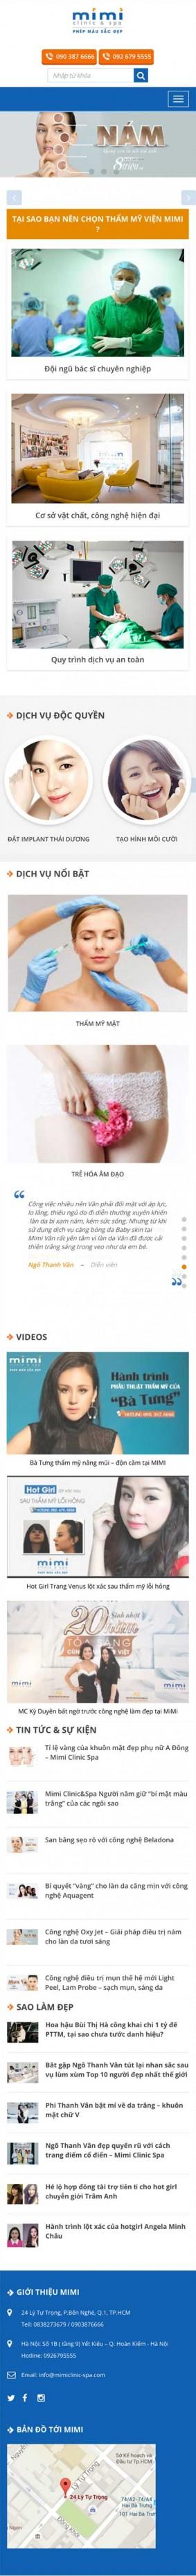 Thiết kế web trung tâm thẩm mỹ Mimi